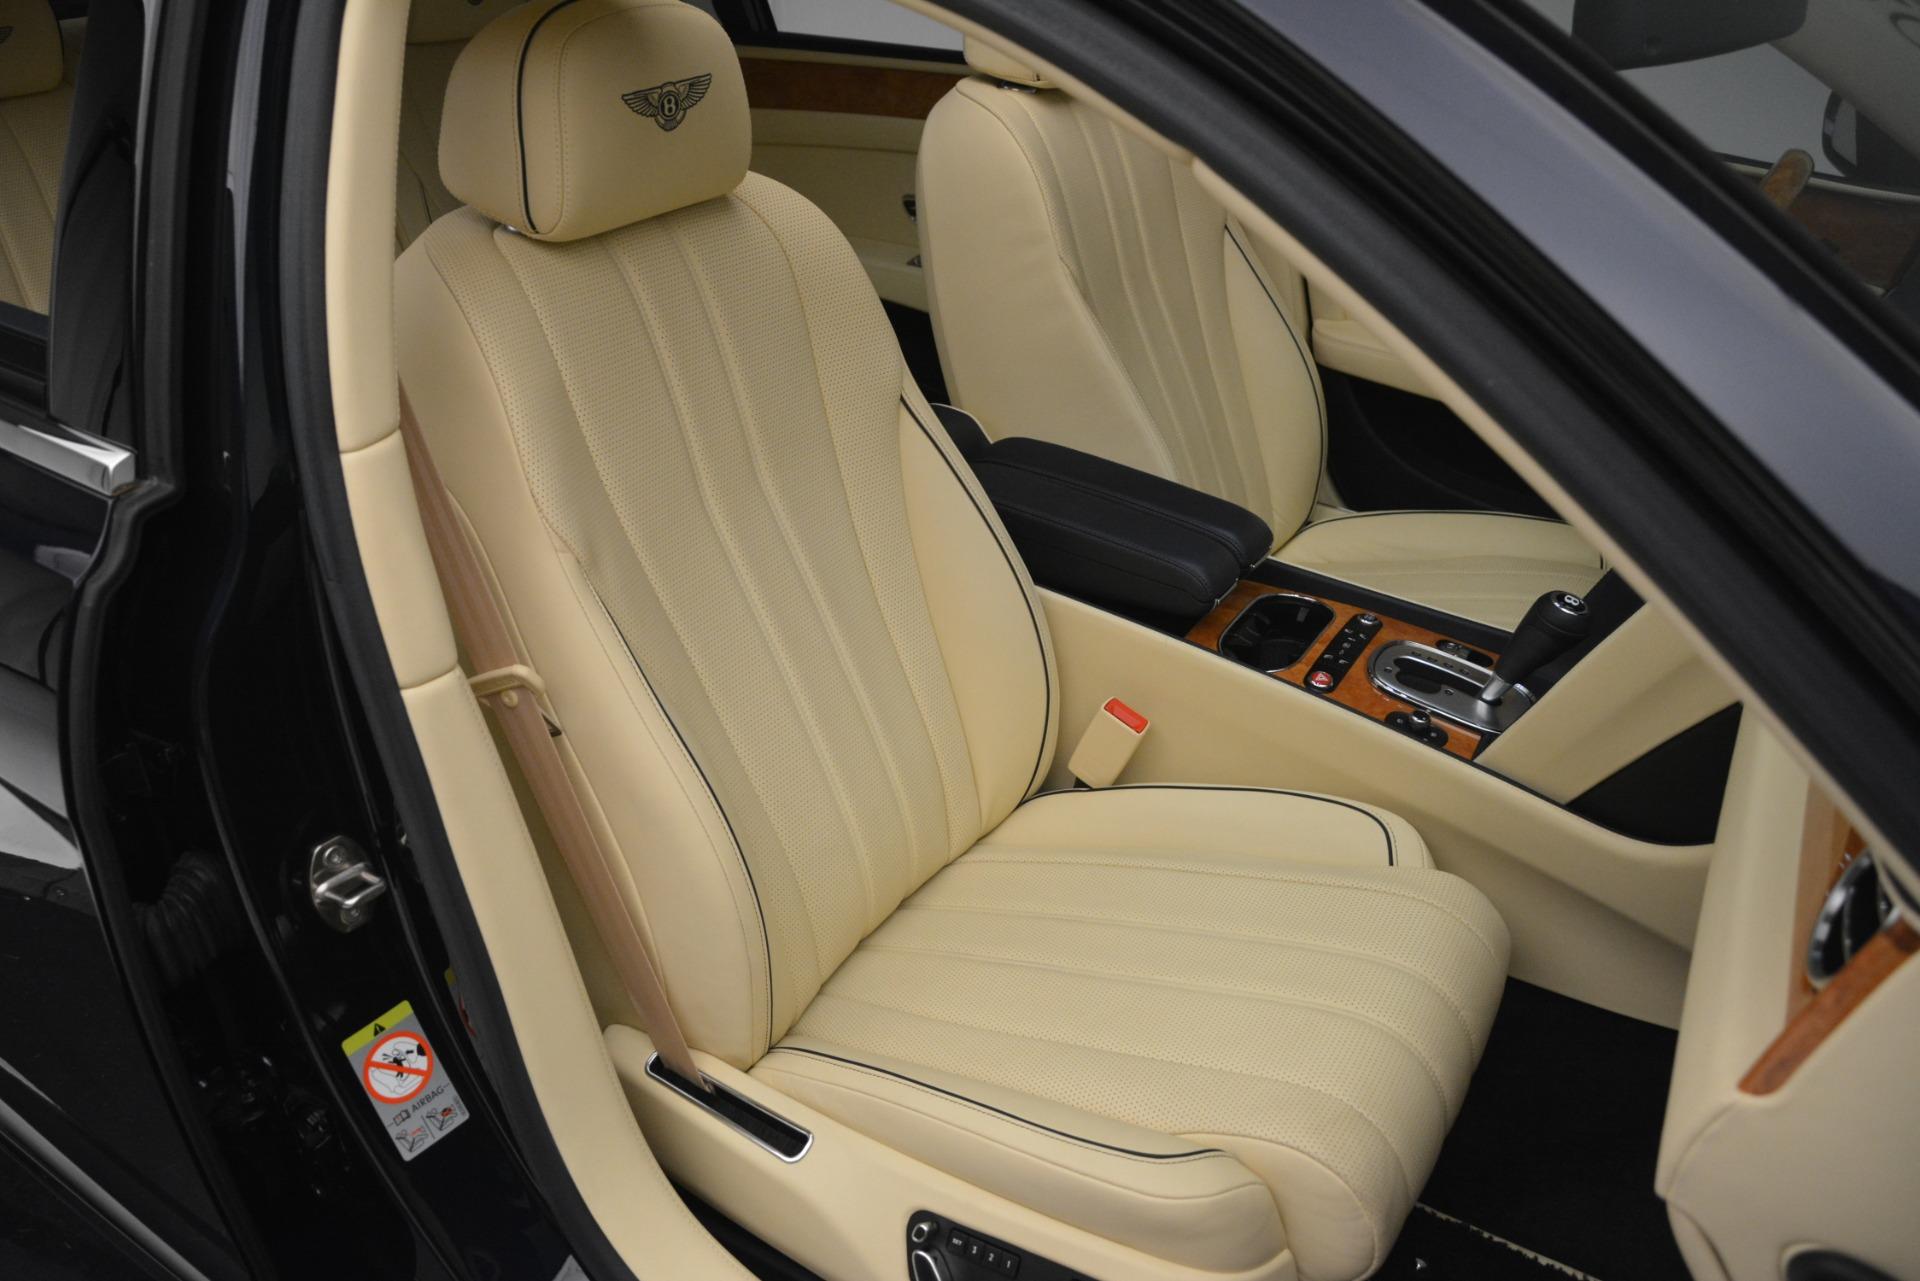 Used 2015 Bentley Flying Spur V8 For Sale In Westport, CT 2997_p31